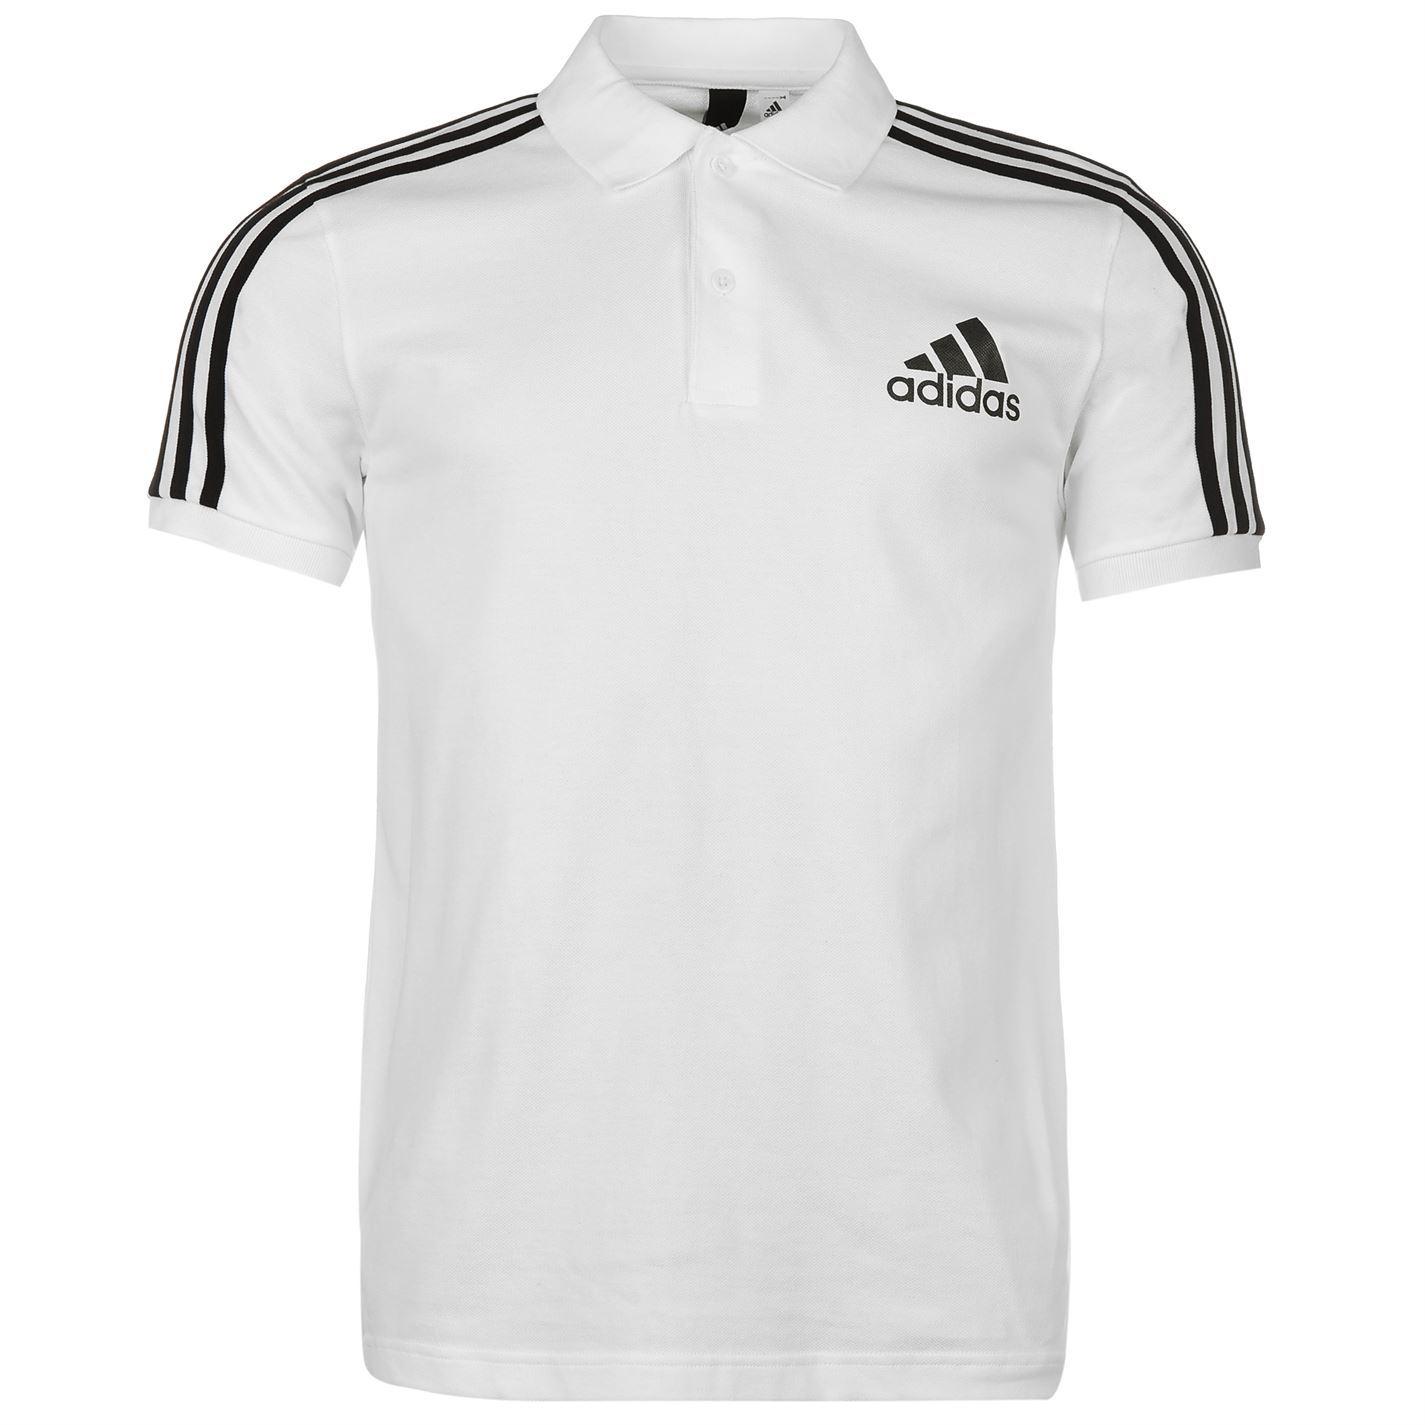 07f5822c adidas 3 Stripes Logo Polo Shirt Mens White/Black Collar T-Shirt Top  Sportswear